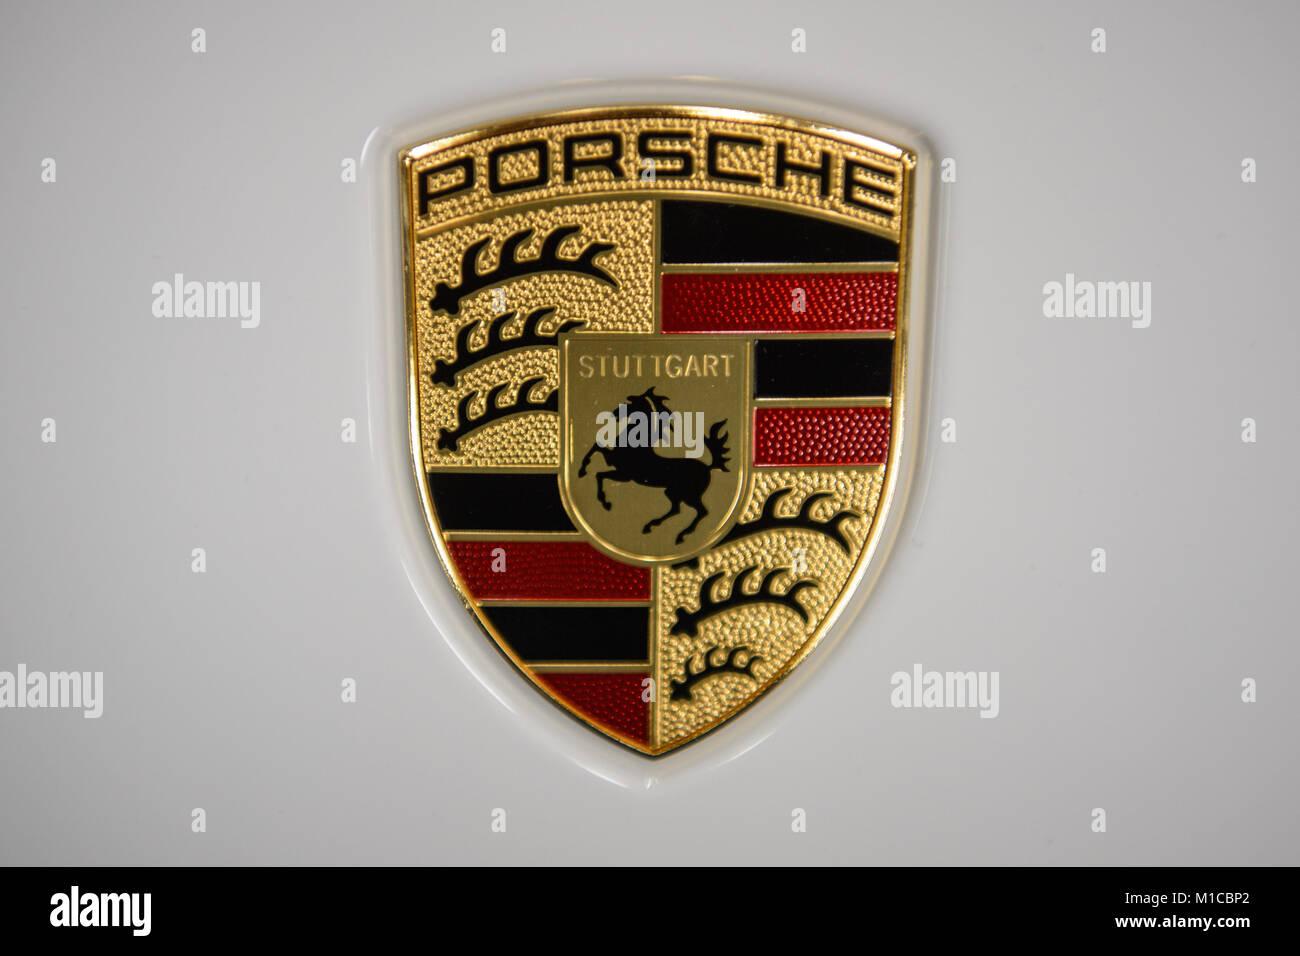 The Logo Of The German Automobile Company Porsche Decorates A Car At